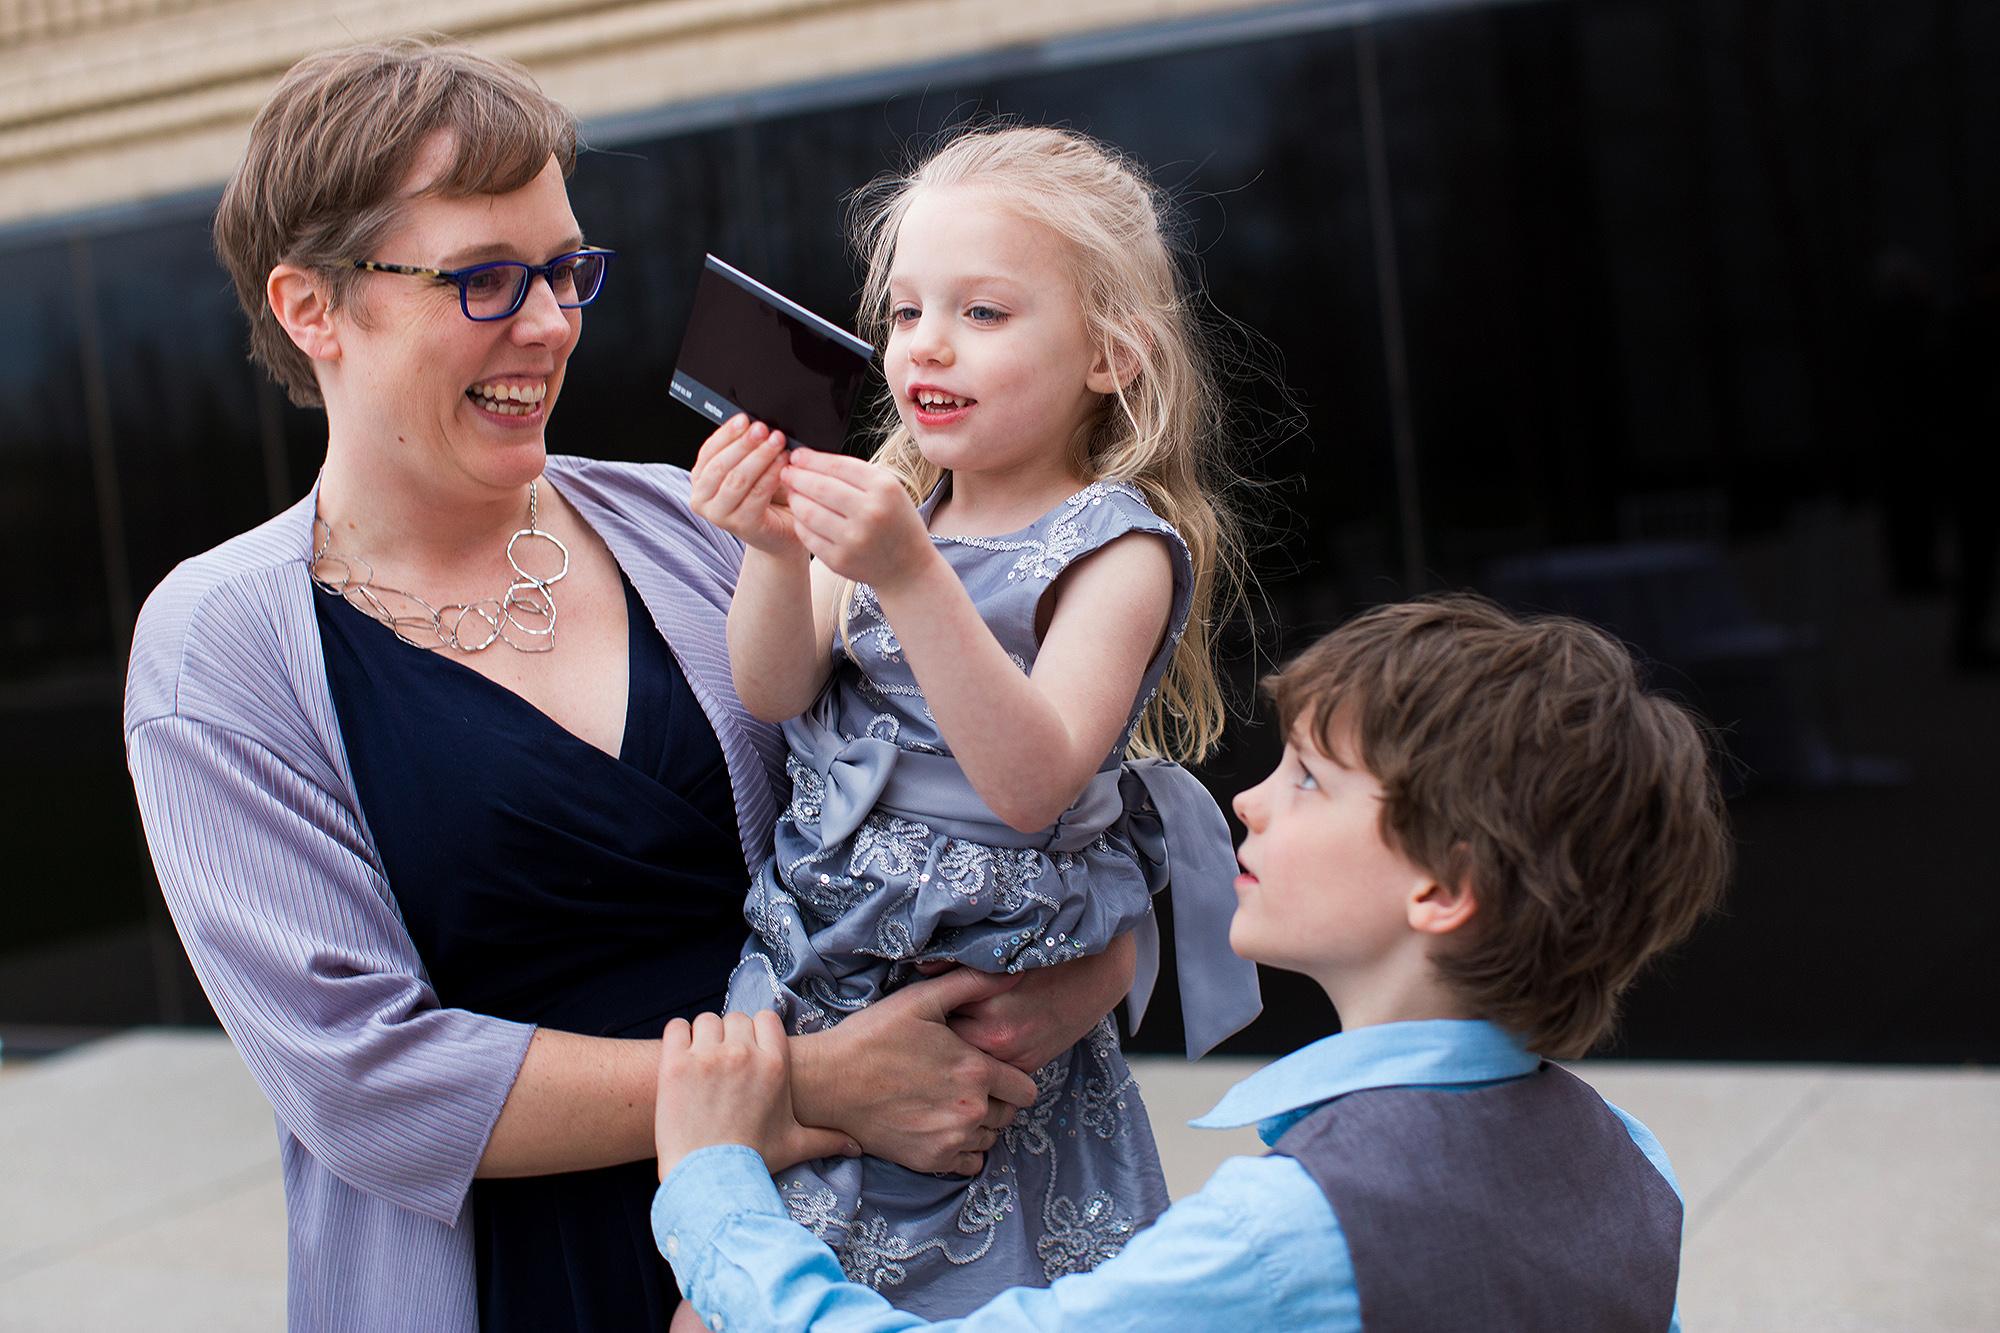 7-mom-kids-looking-at-photo-st-louis-art-history-museum-sarah-corbett-photography-polaroids.jpg